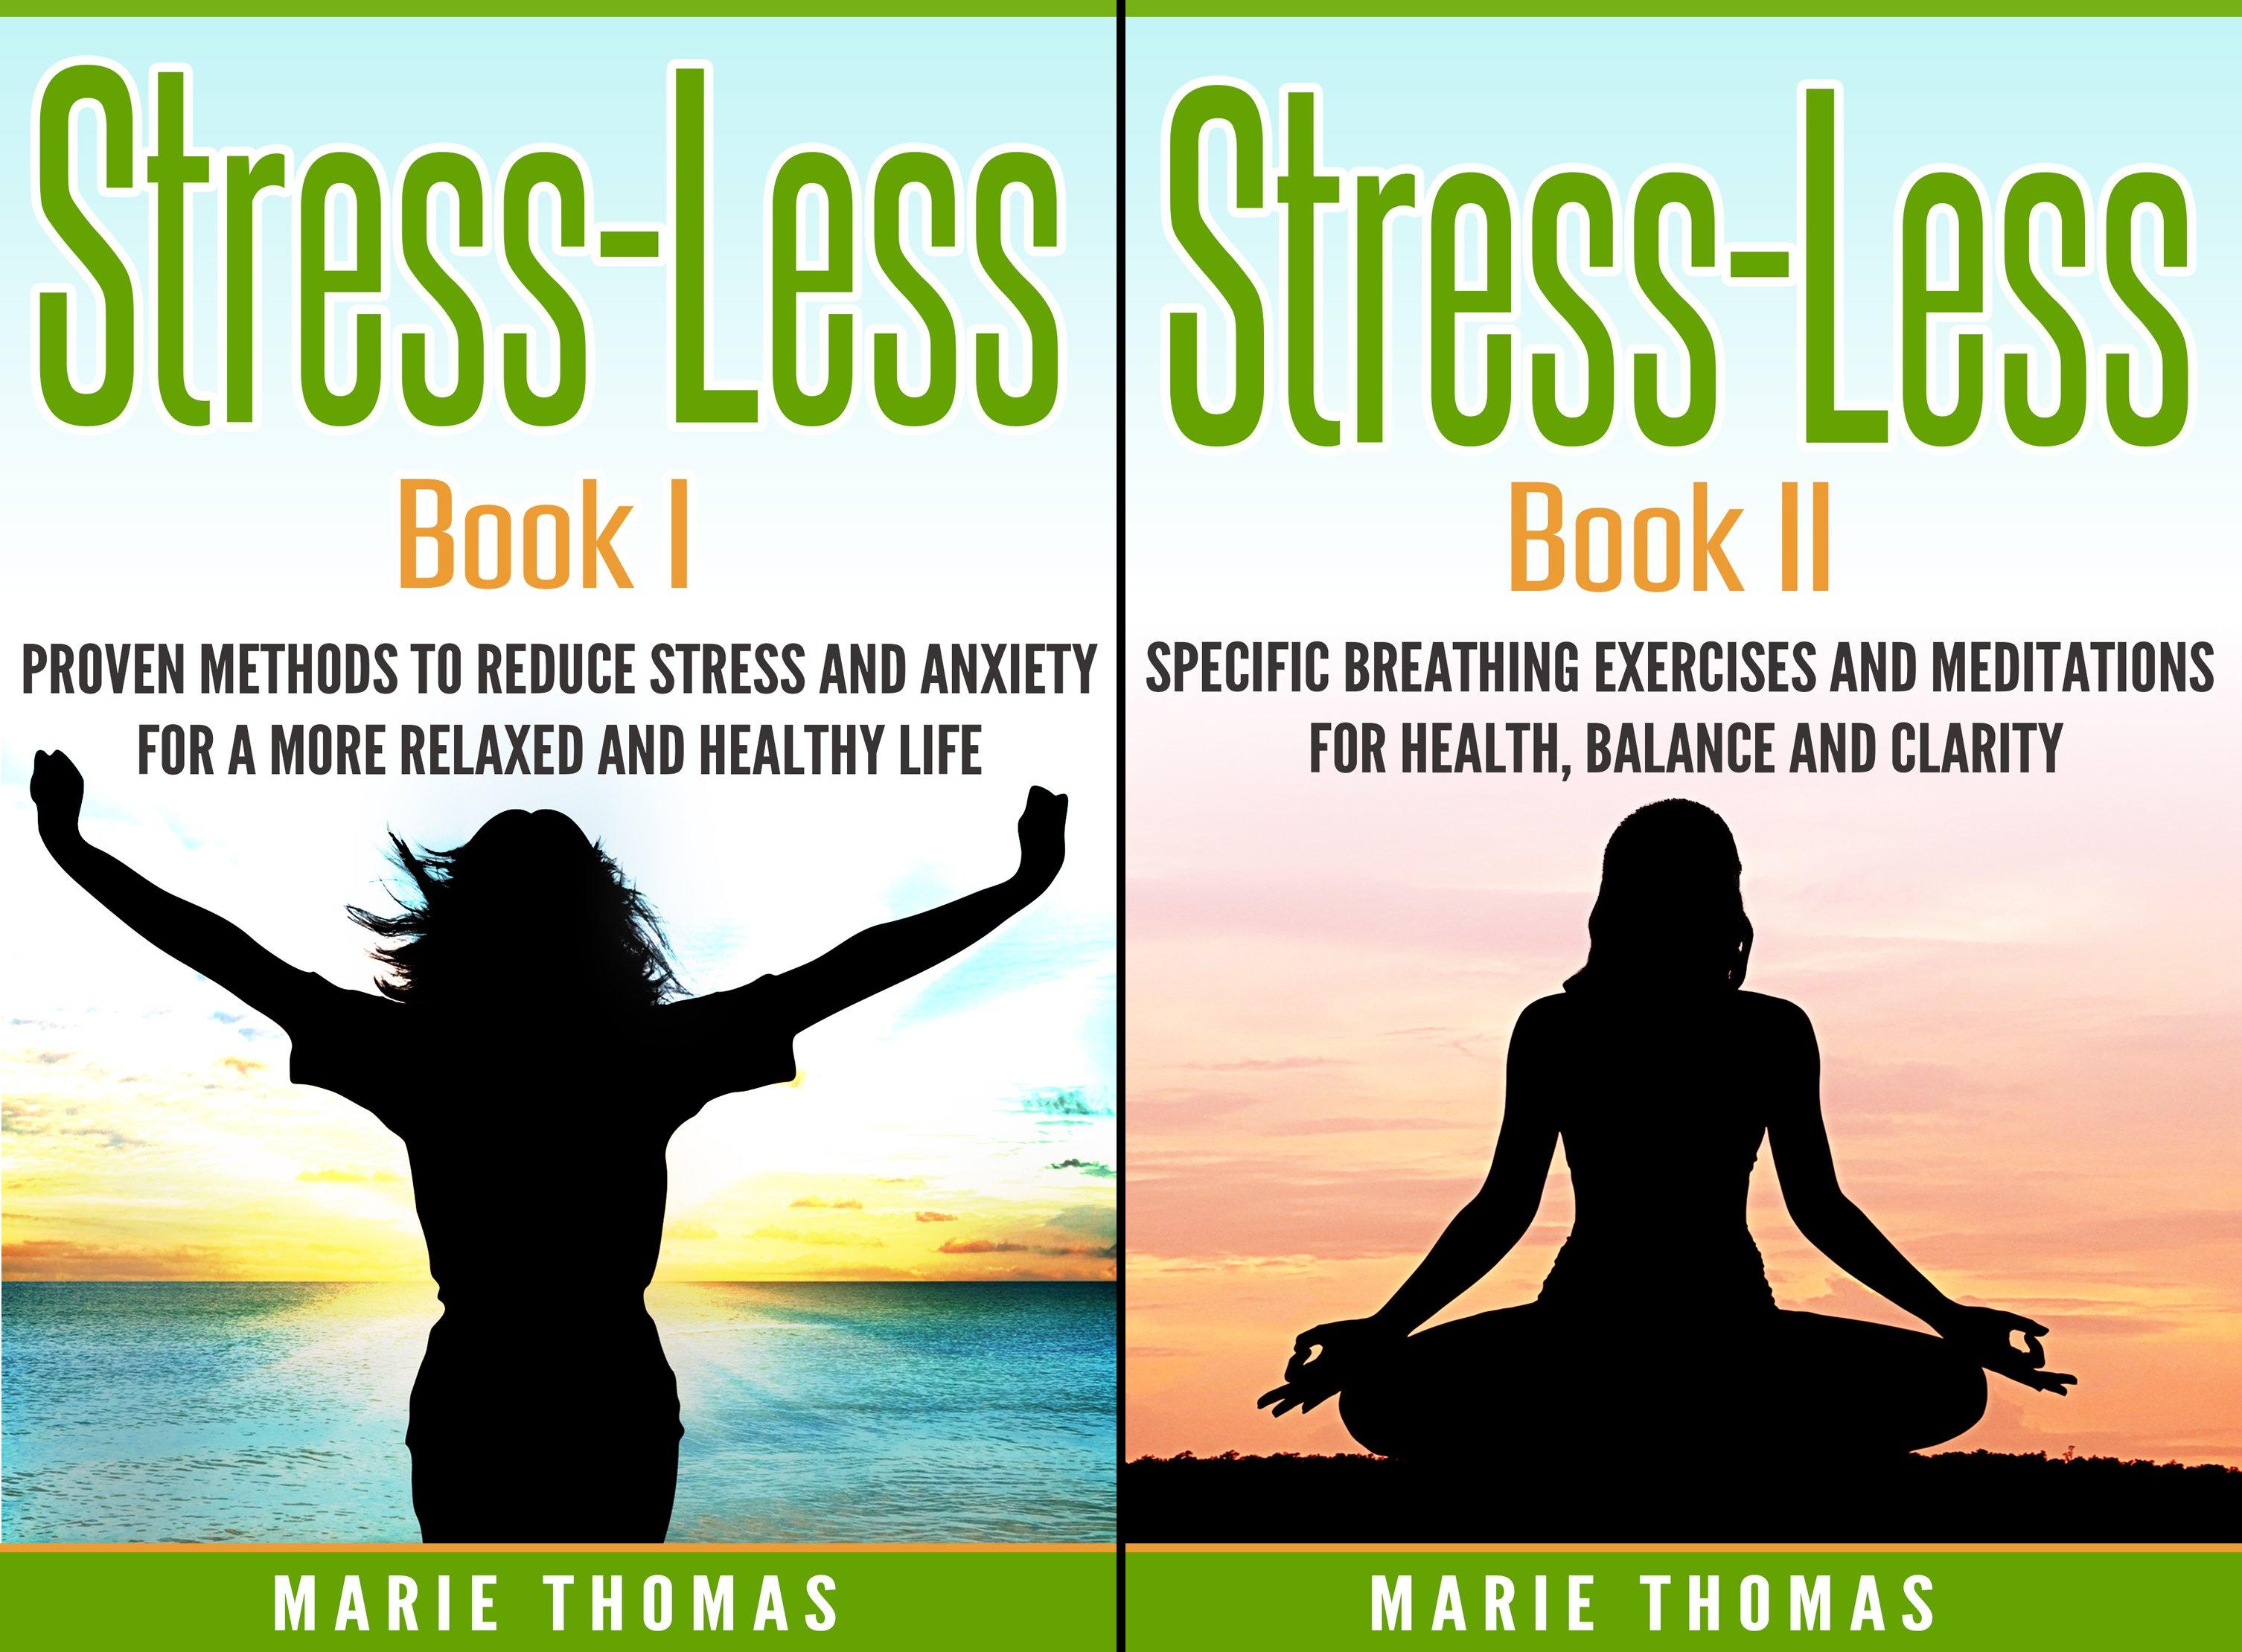 Stress-Less (2 Book Series)